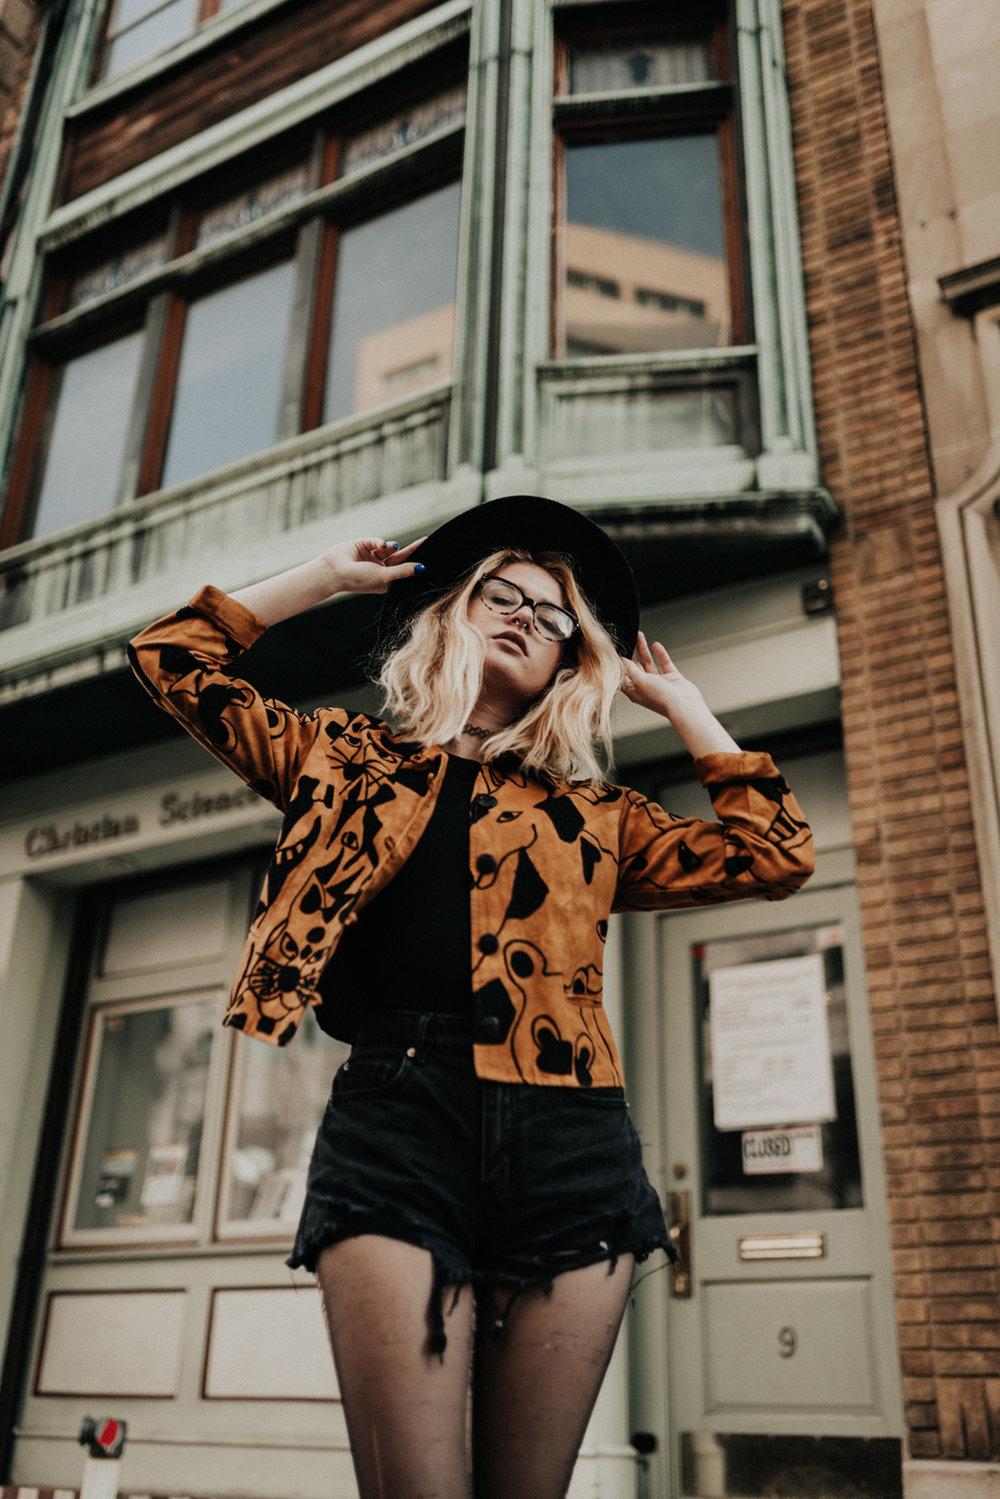 KyleWillisPhoto-Kyle-Willis-Photography-Portland-Oregon-Trenton-New-Jersey-Portrait-Photographer-Retro-Boho-Vintage-Philadelphia-York-City-Lifestyle